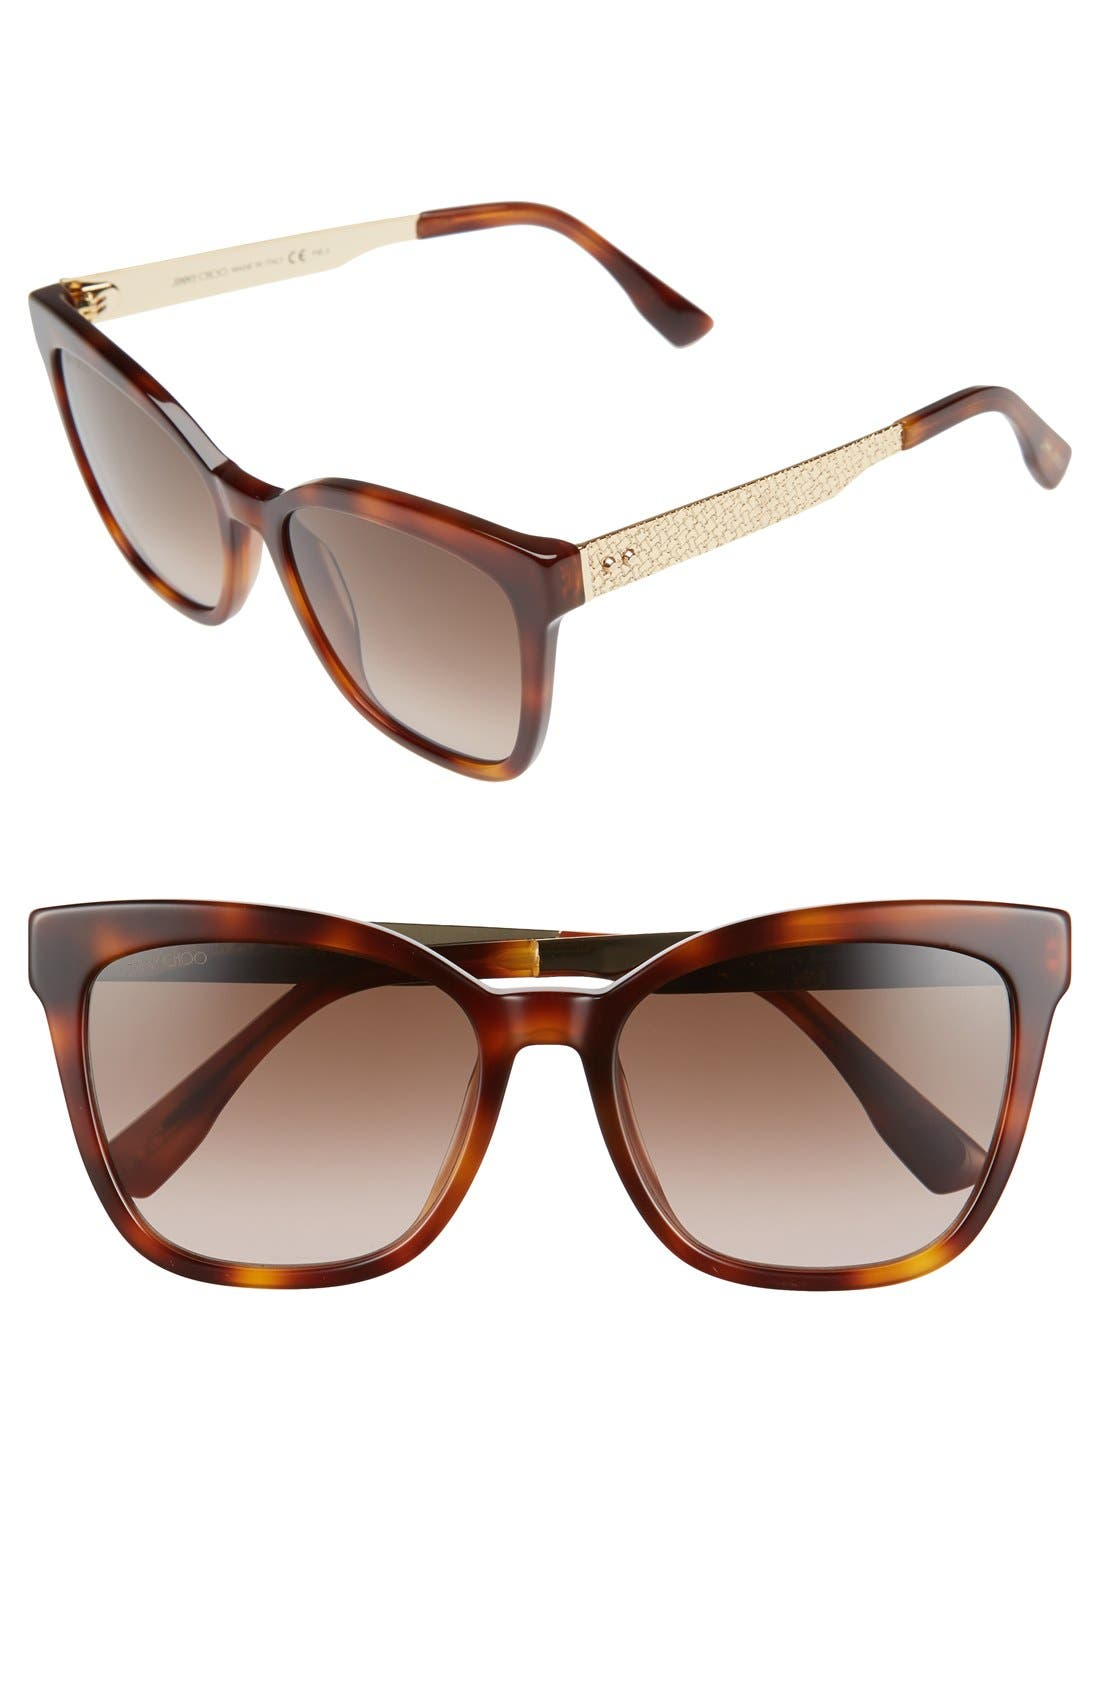 55mm Retro Sunglasses,                             Main thumbnail 2, color,